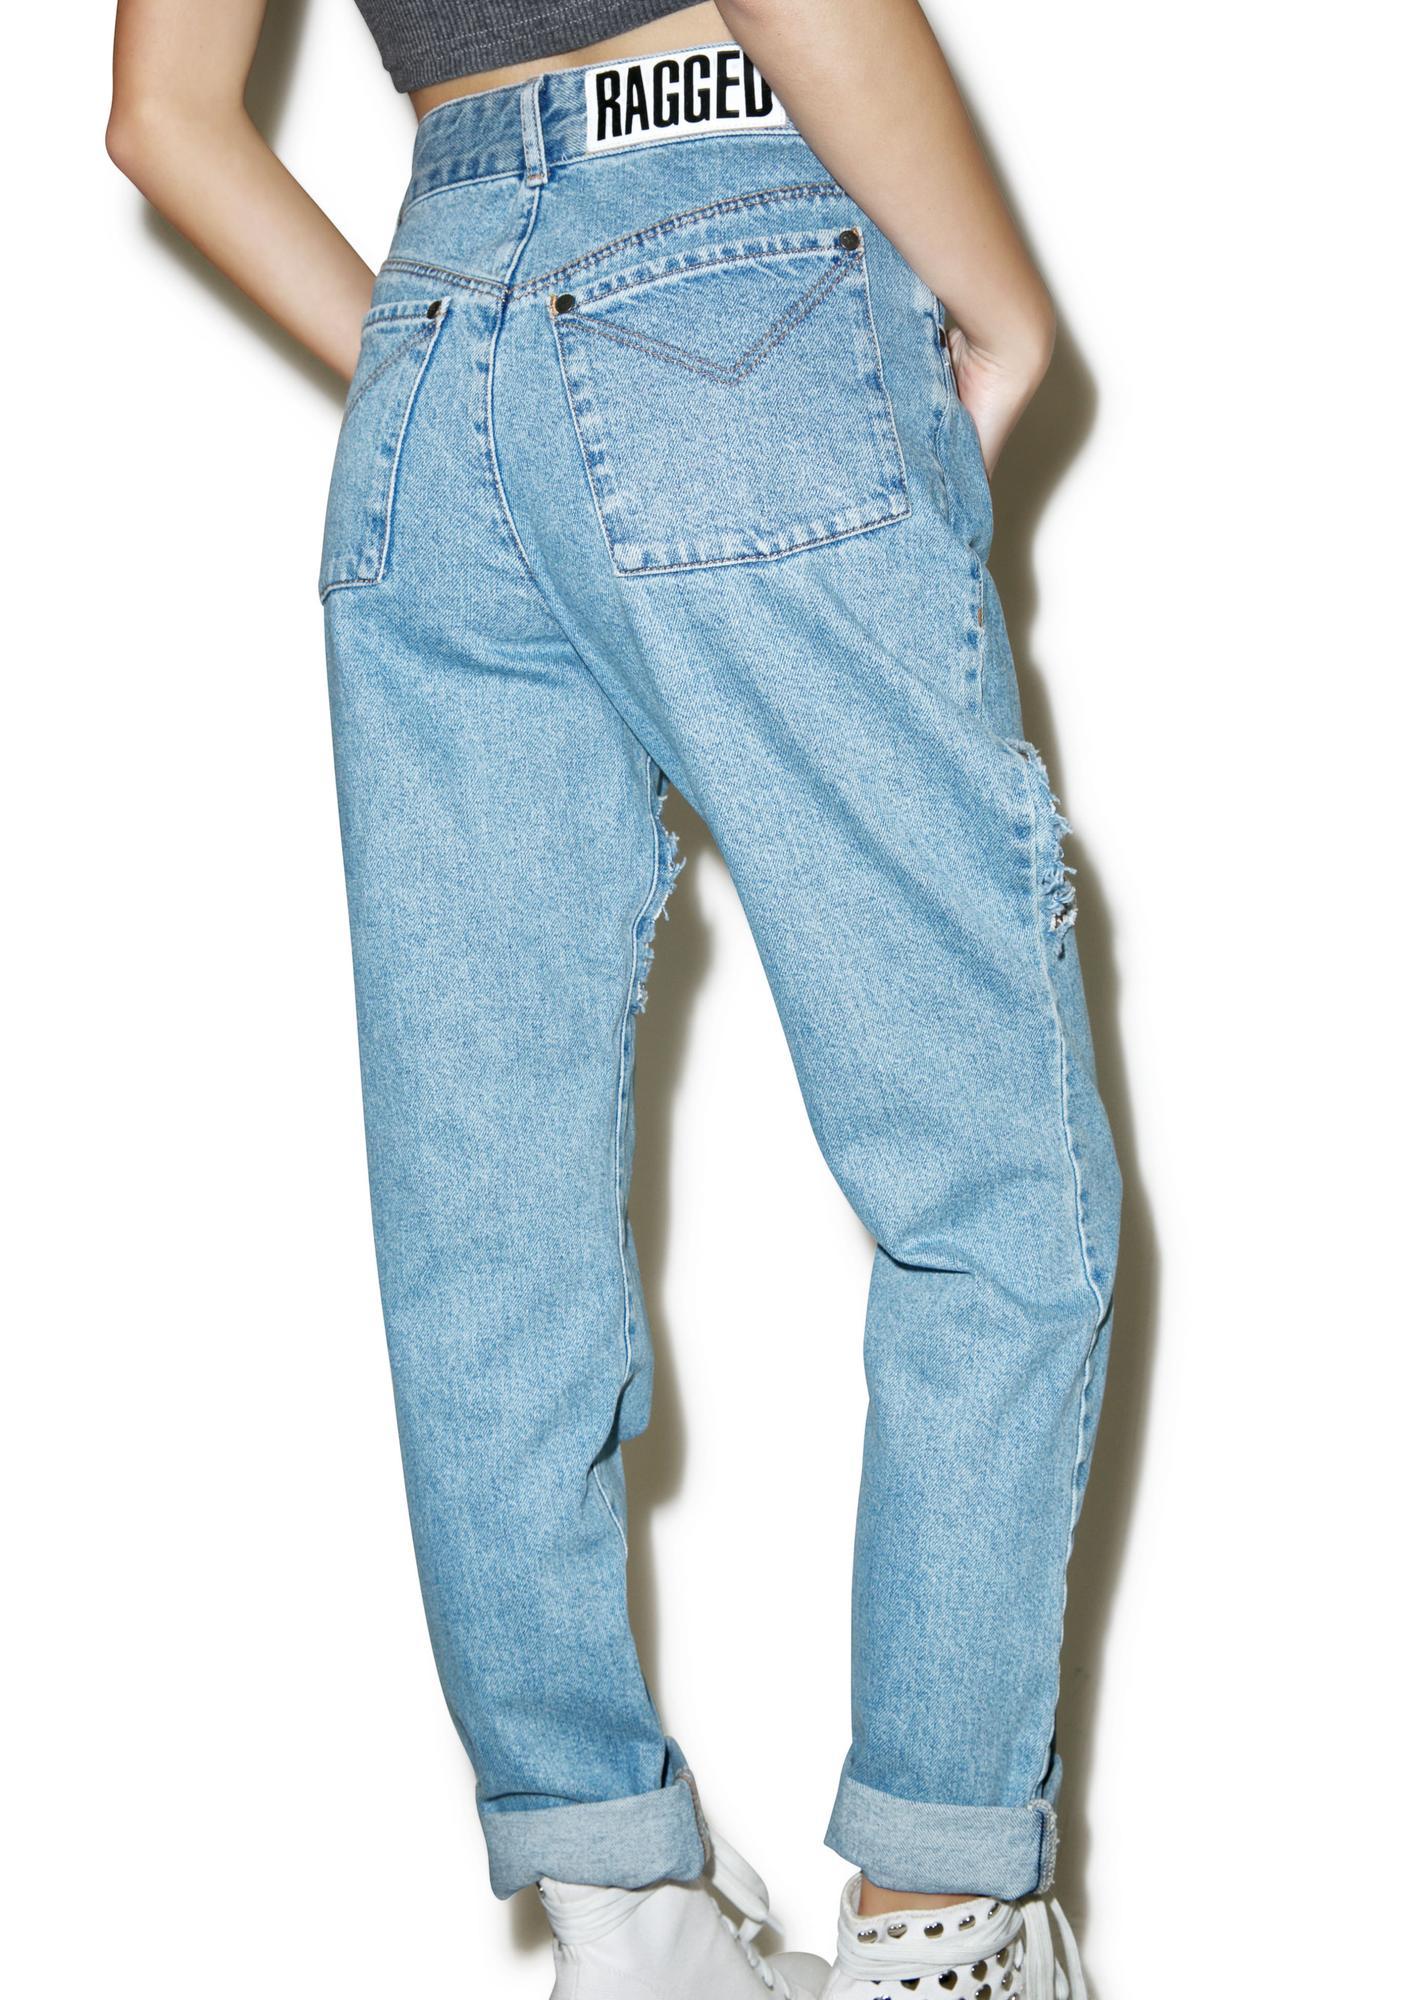 The Ragged Priest Cherub Jeans